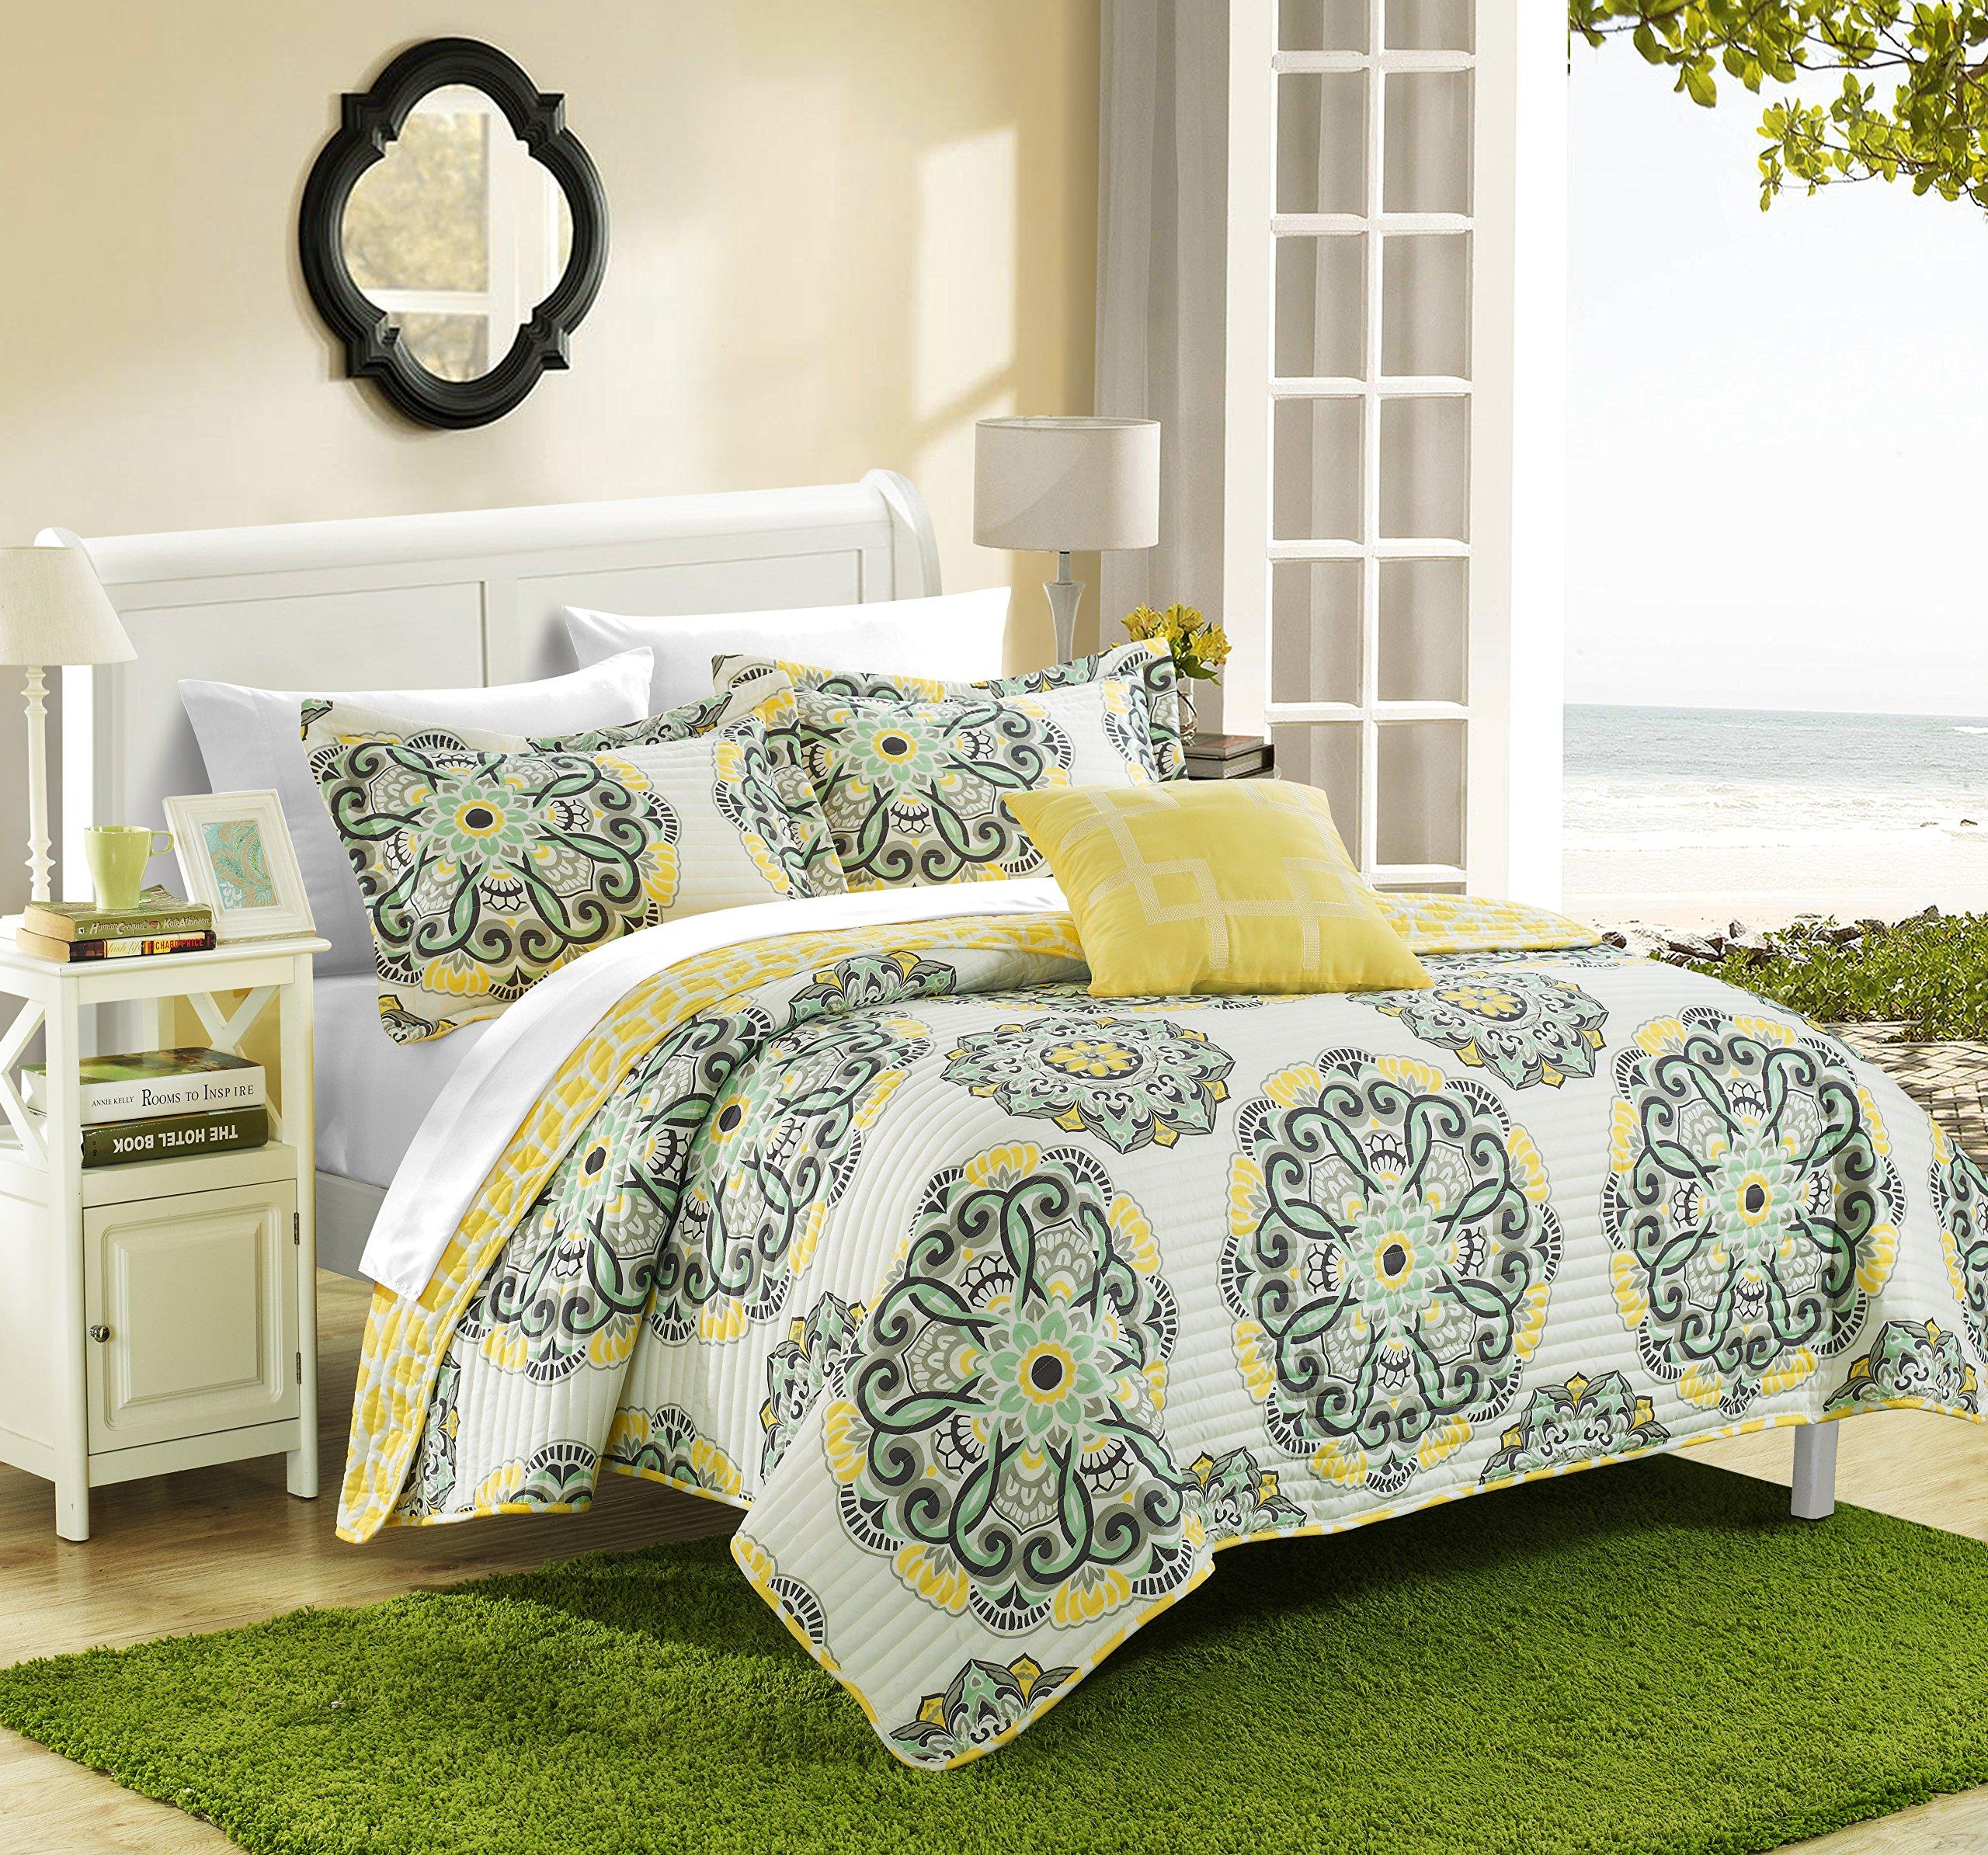 Chic Home Madrid Bedding Set, Yellow, King